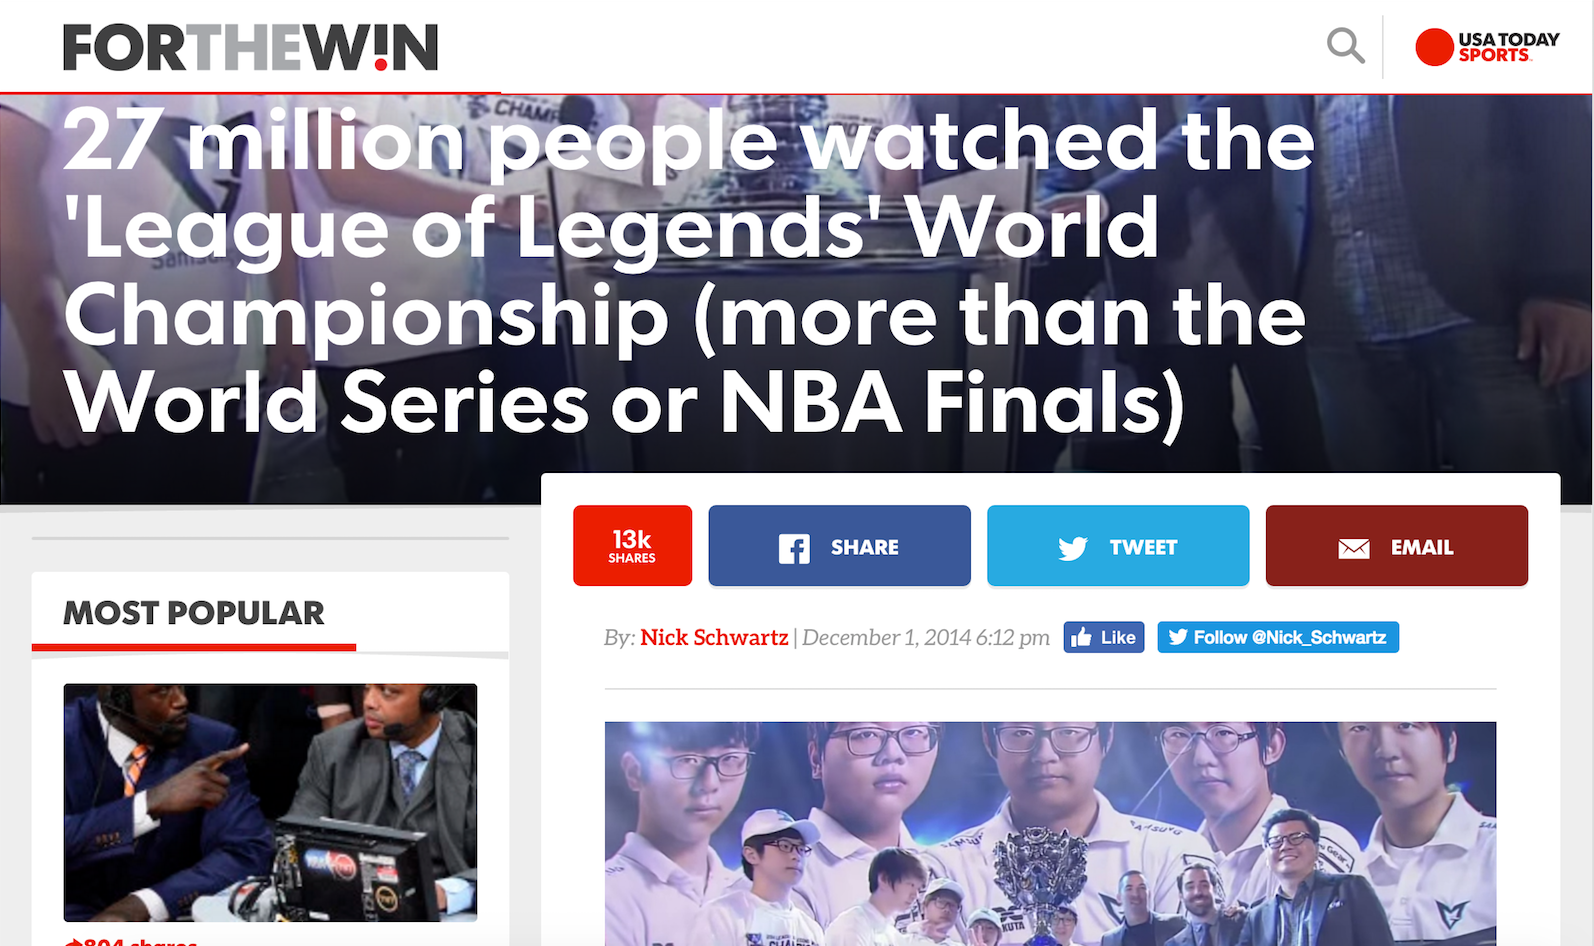 USA Today's League of Legends Headline (Photo: USA Today)